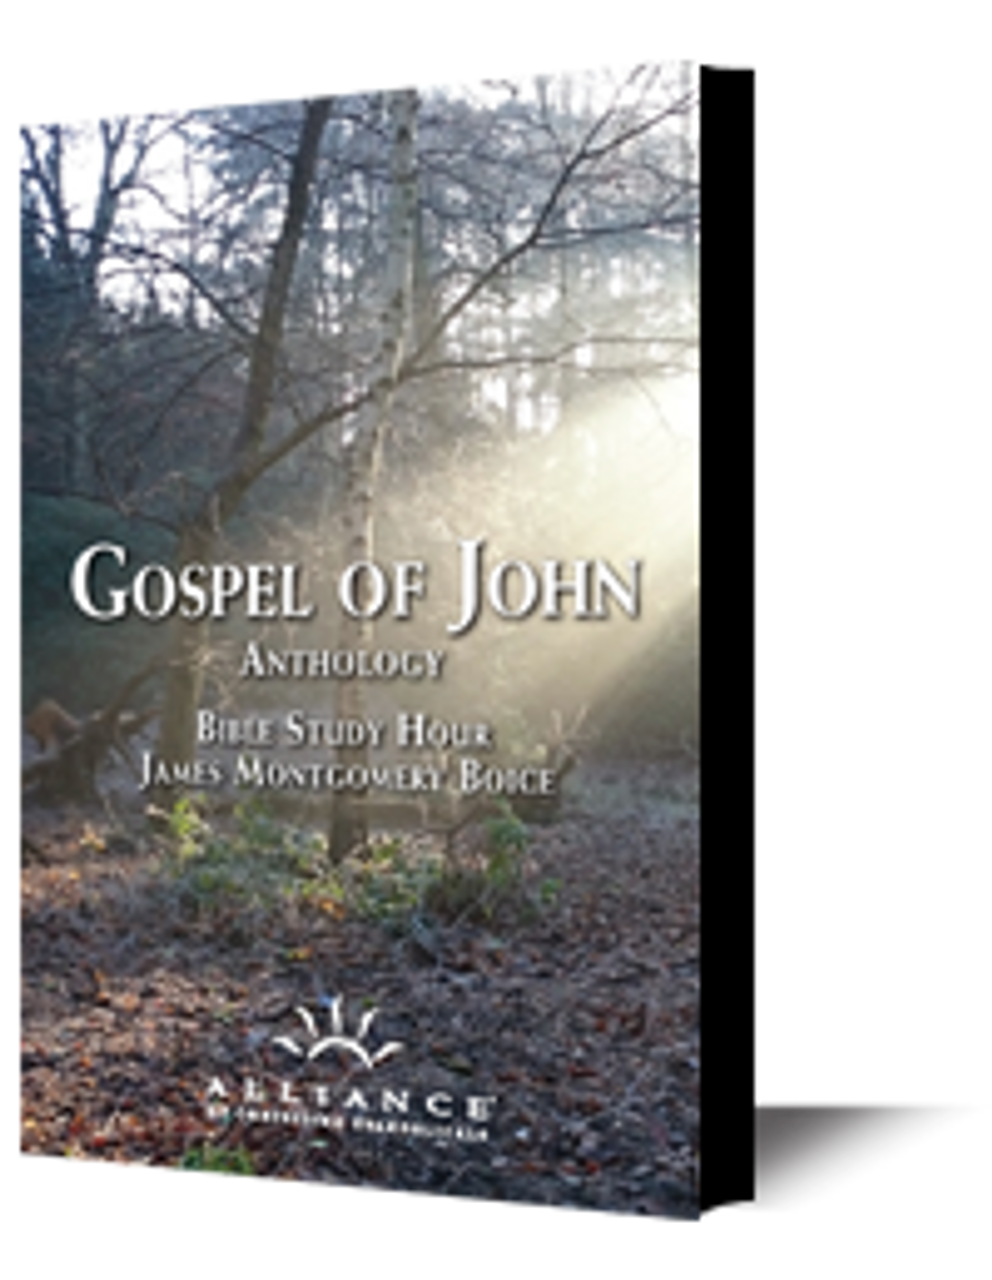 Introducing John's Gospel (mp3 download)